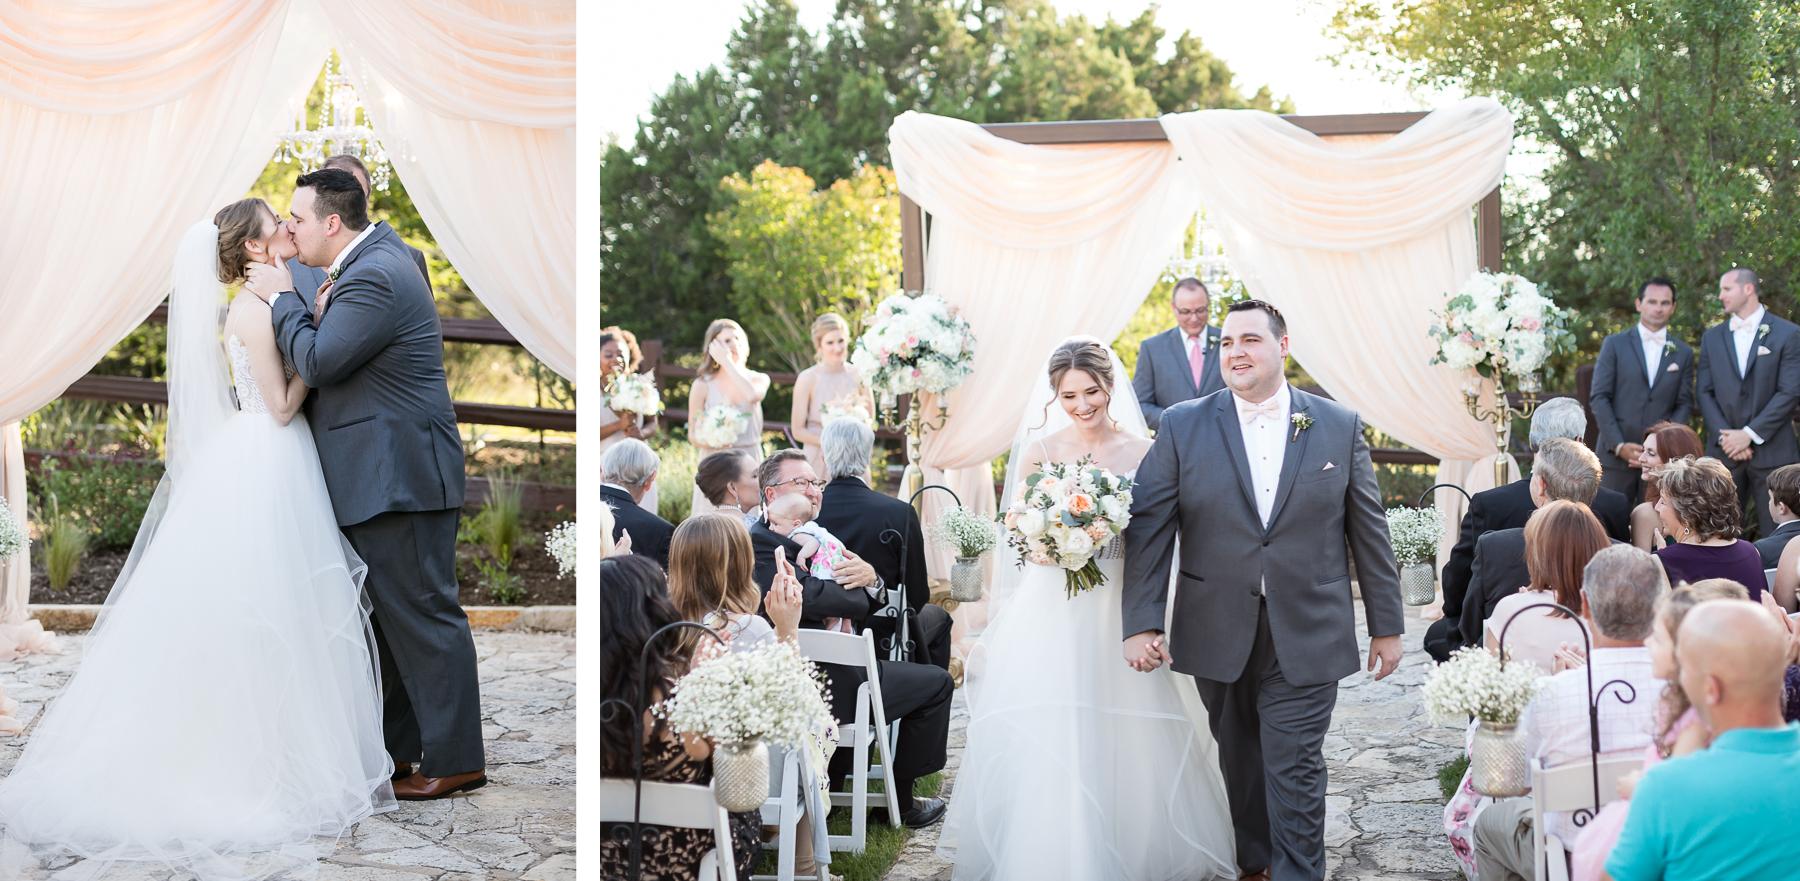 Wedding-photographer-videographer-austin.jpg